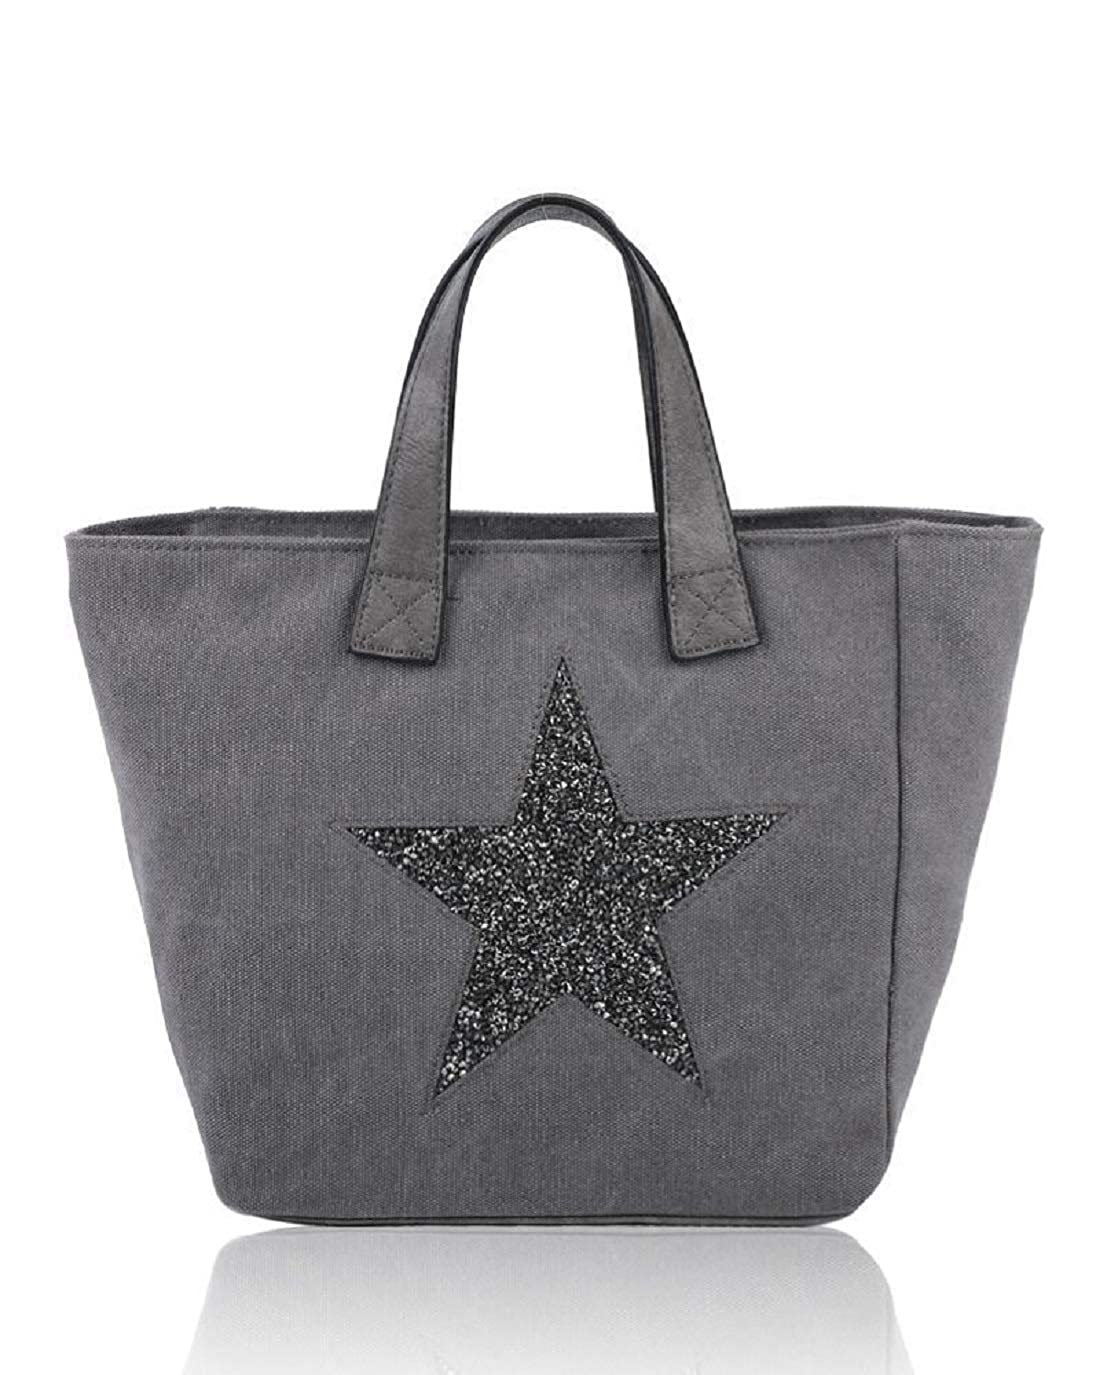 Dark Grey Womens Ladies Canvas Tote Handbag Glitter Star Pattern Party Shoulder Bag